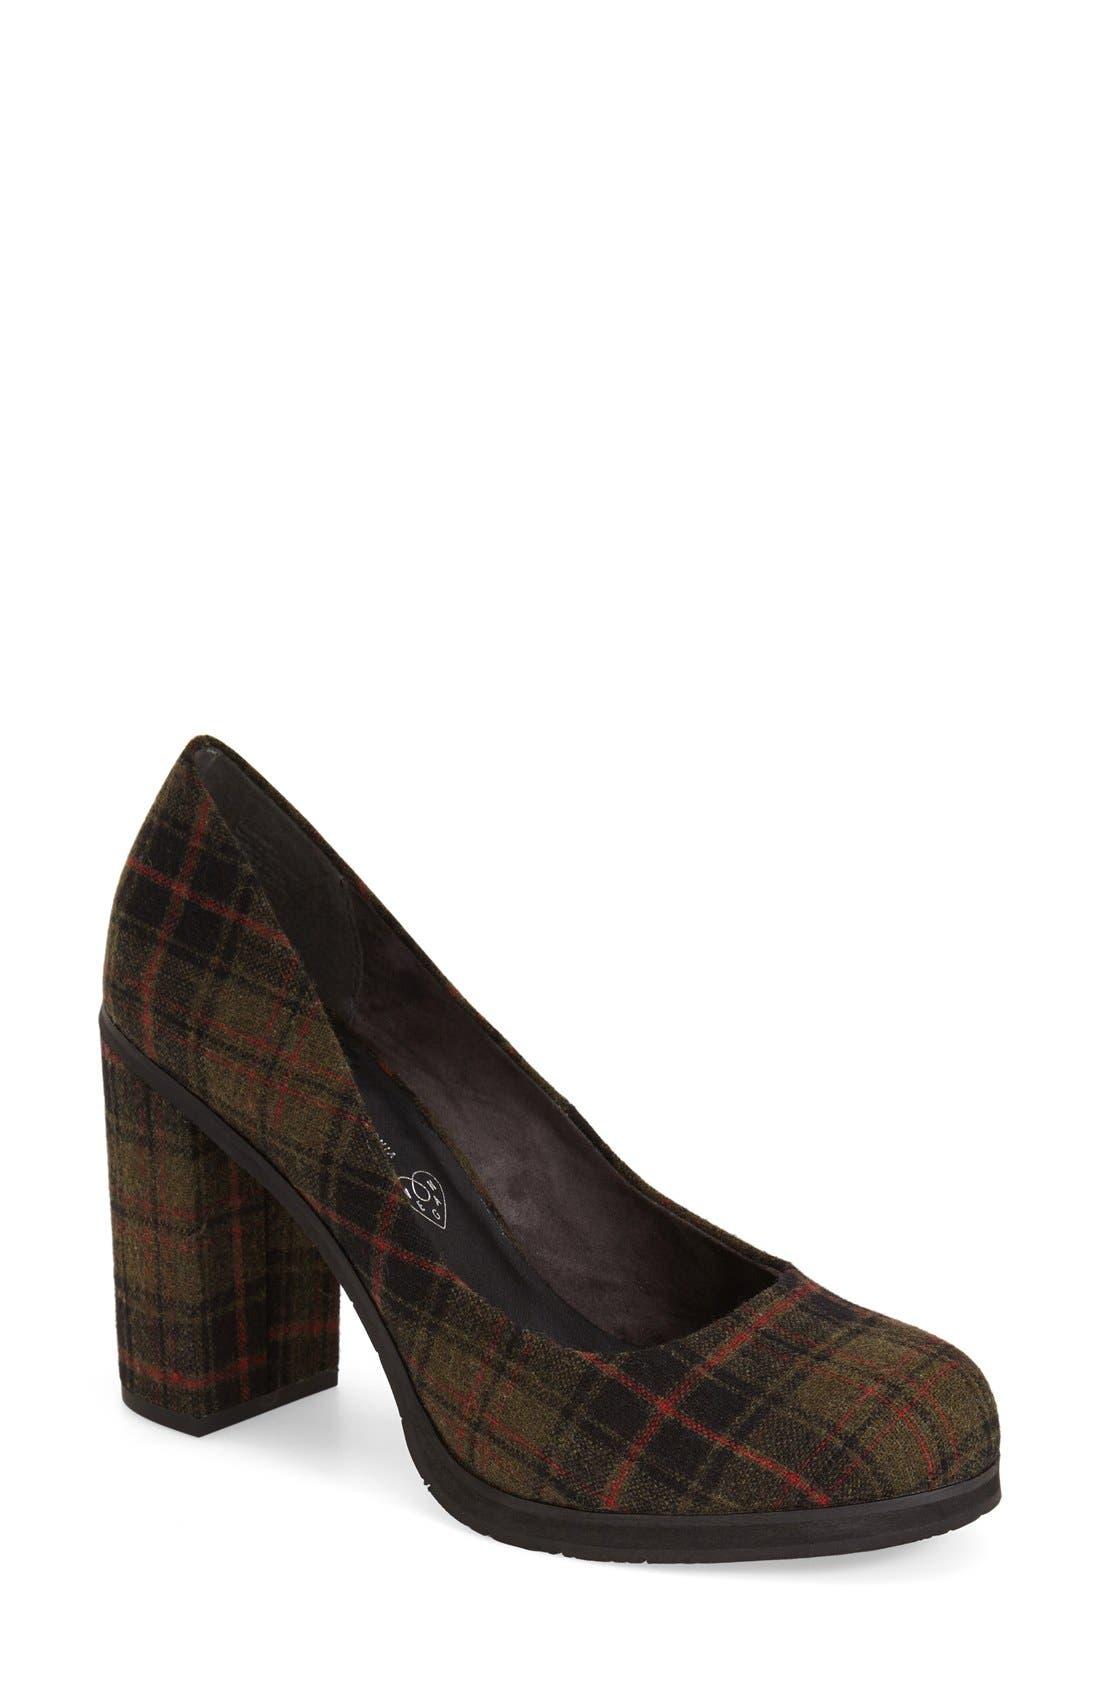 Alternate Image 1 Selected - BC Footwear 'Turf' Pump (Women)